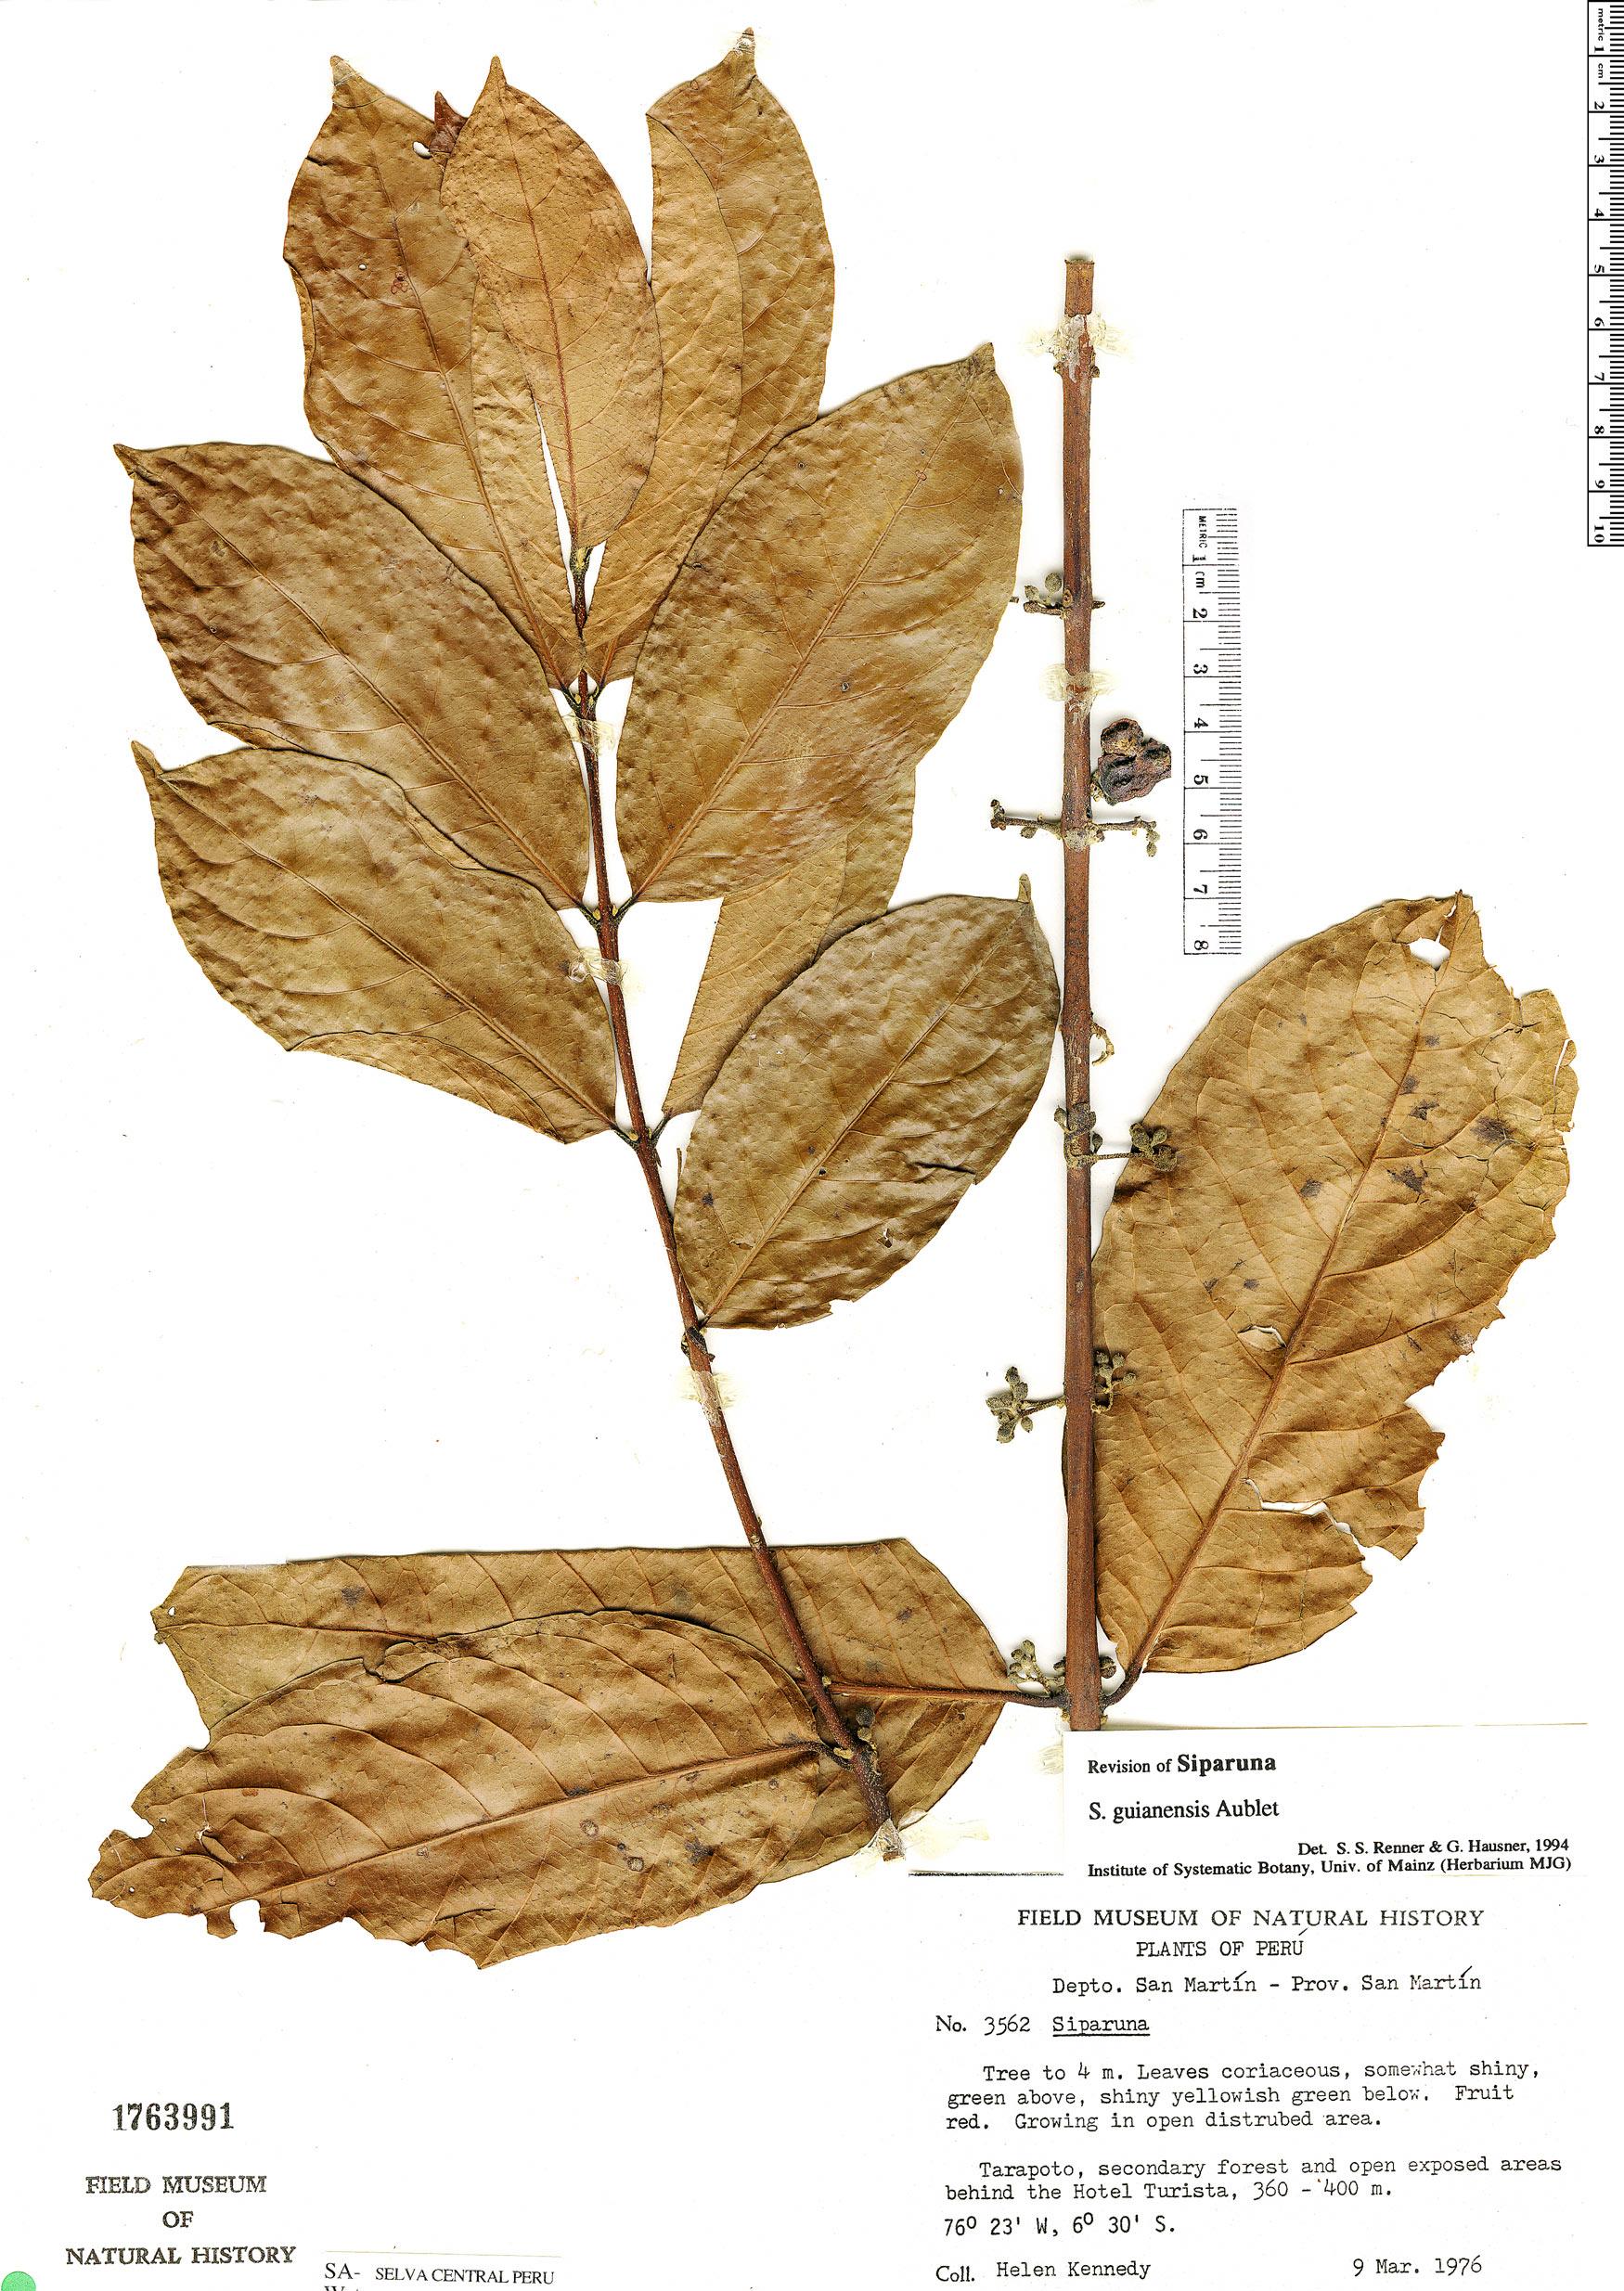 Espécime: Siparuna guianensis